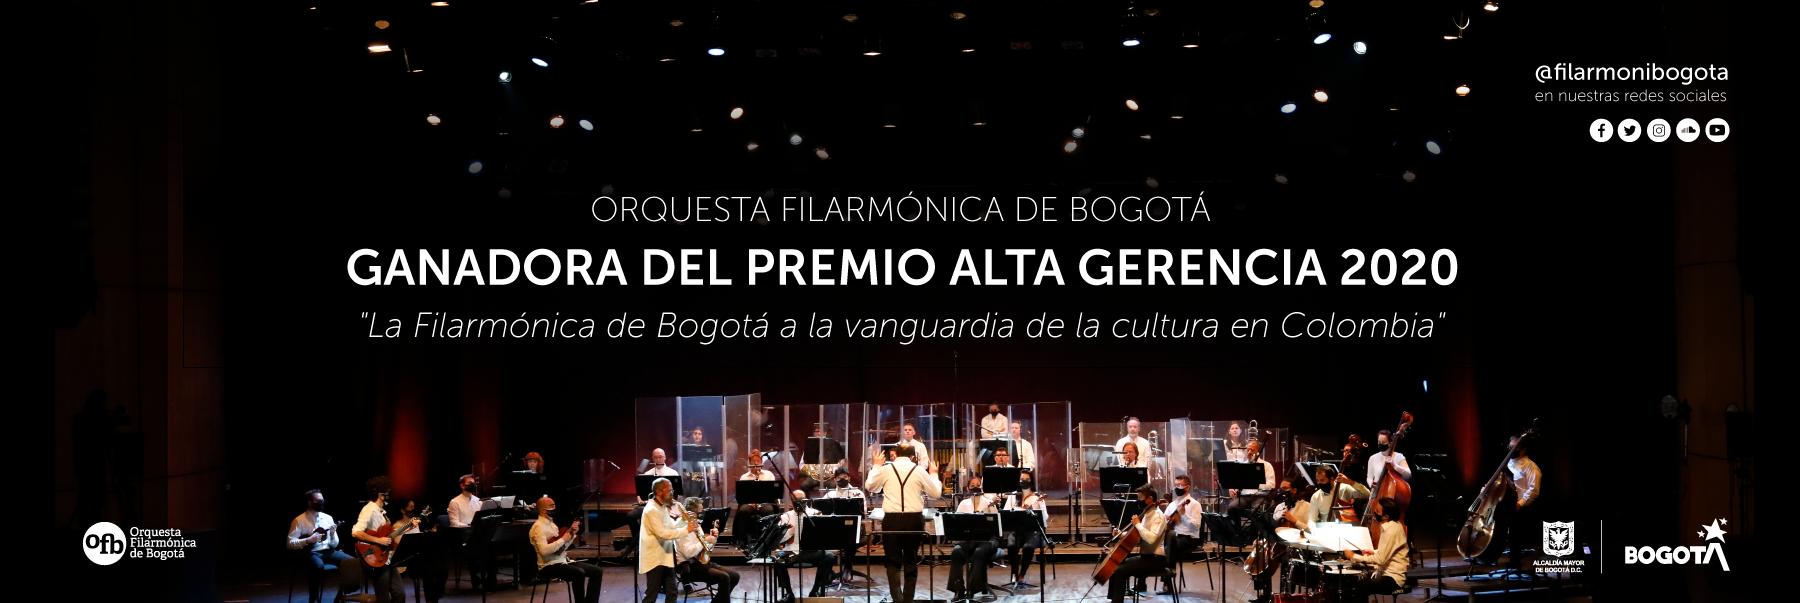 OFB GANADORA PREMIO ALTA GERENCIA 2020